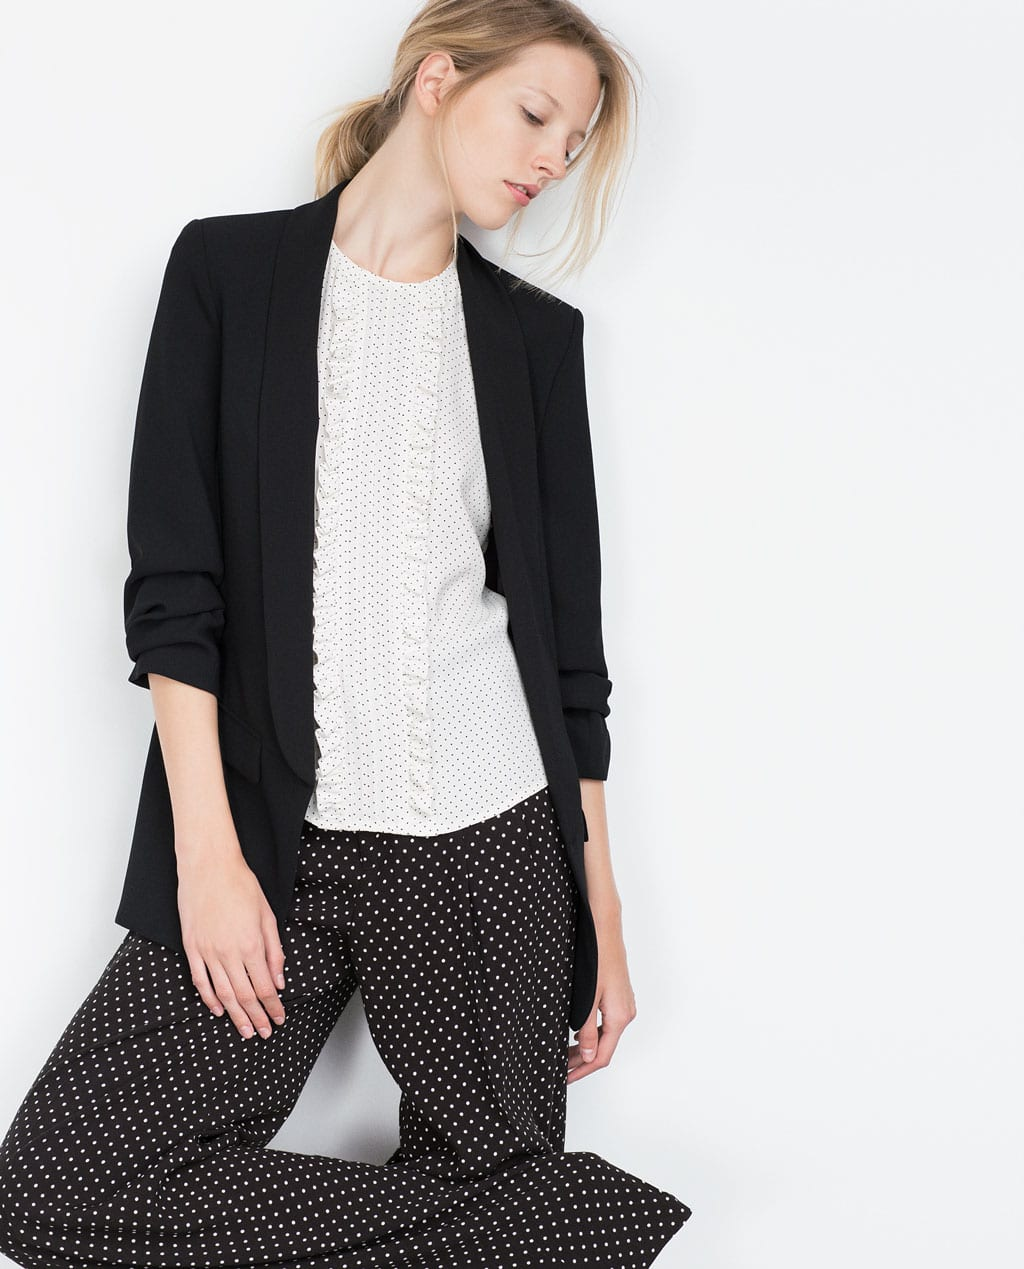 favoritos de zara coleccion primavera verano fashion bloggers (29)